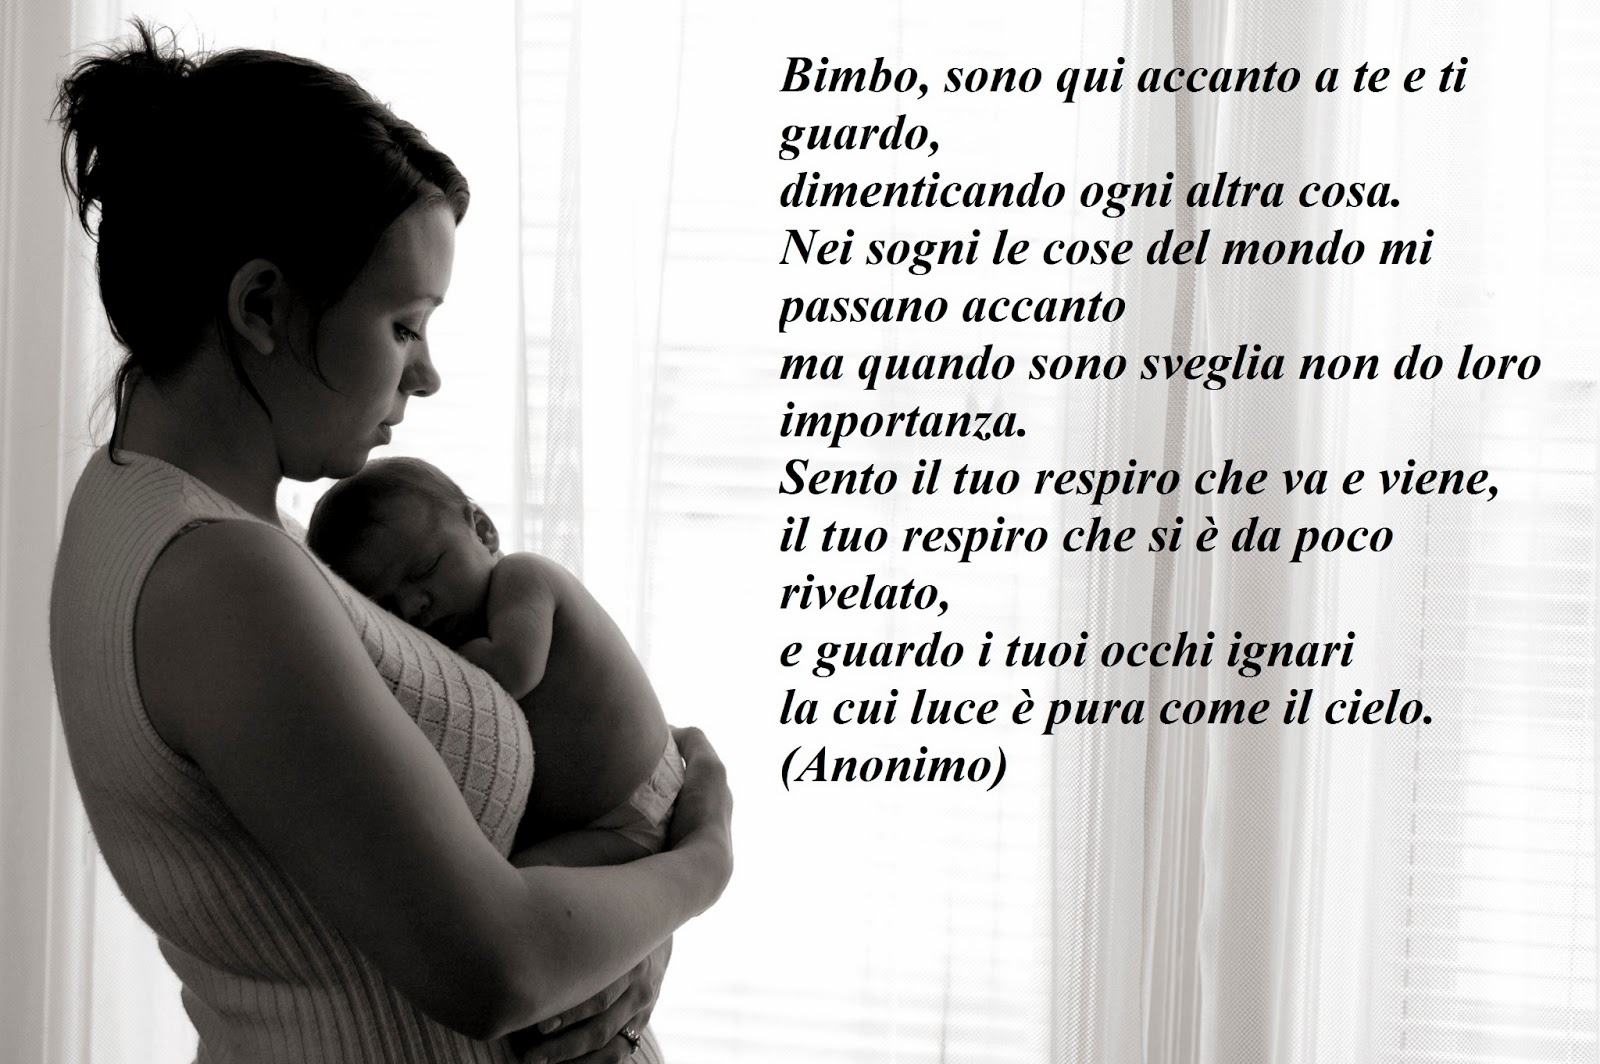 Frasi Belle Sulla Nascita.Frasi Sulla Nascita Dei Bambini